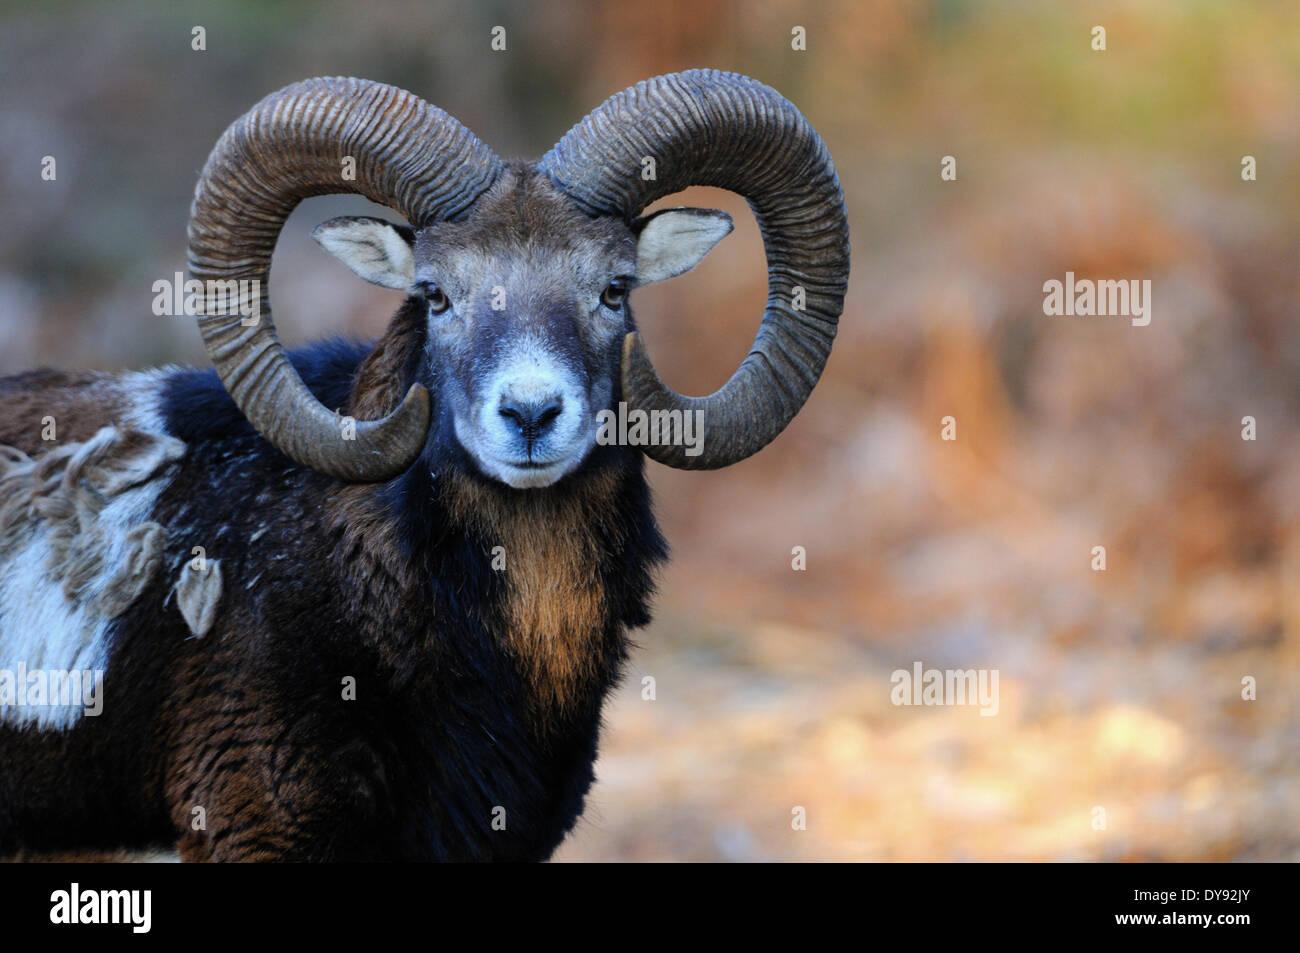 Mufflon ram mountain sheep Ovis ammon musimon winter coat sheep wild sheep goat-antelopes horn horns Mufflons animal Stock Photo